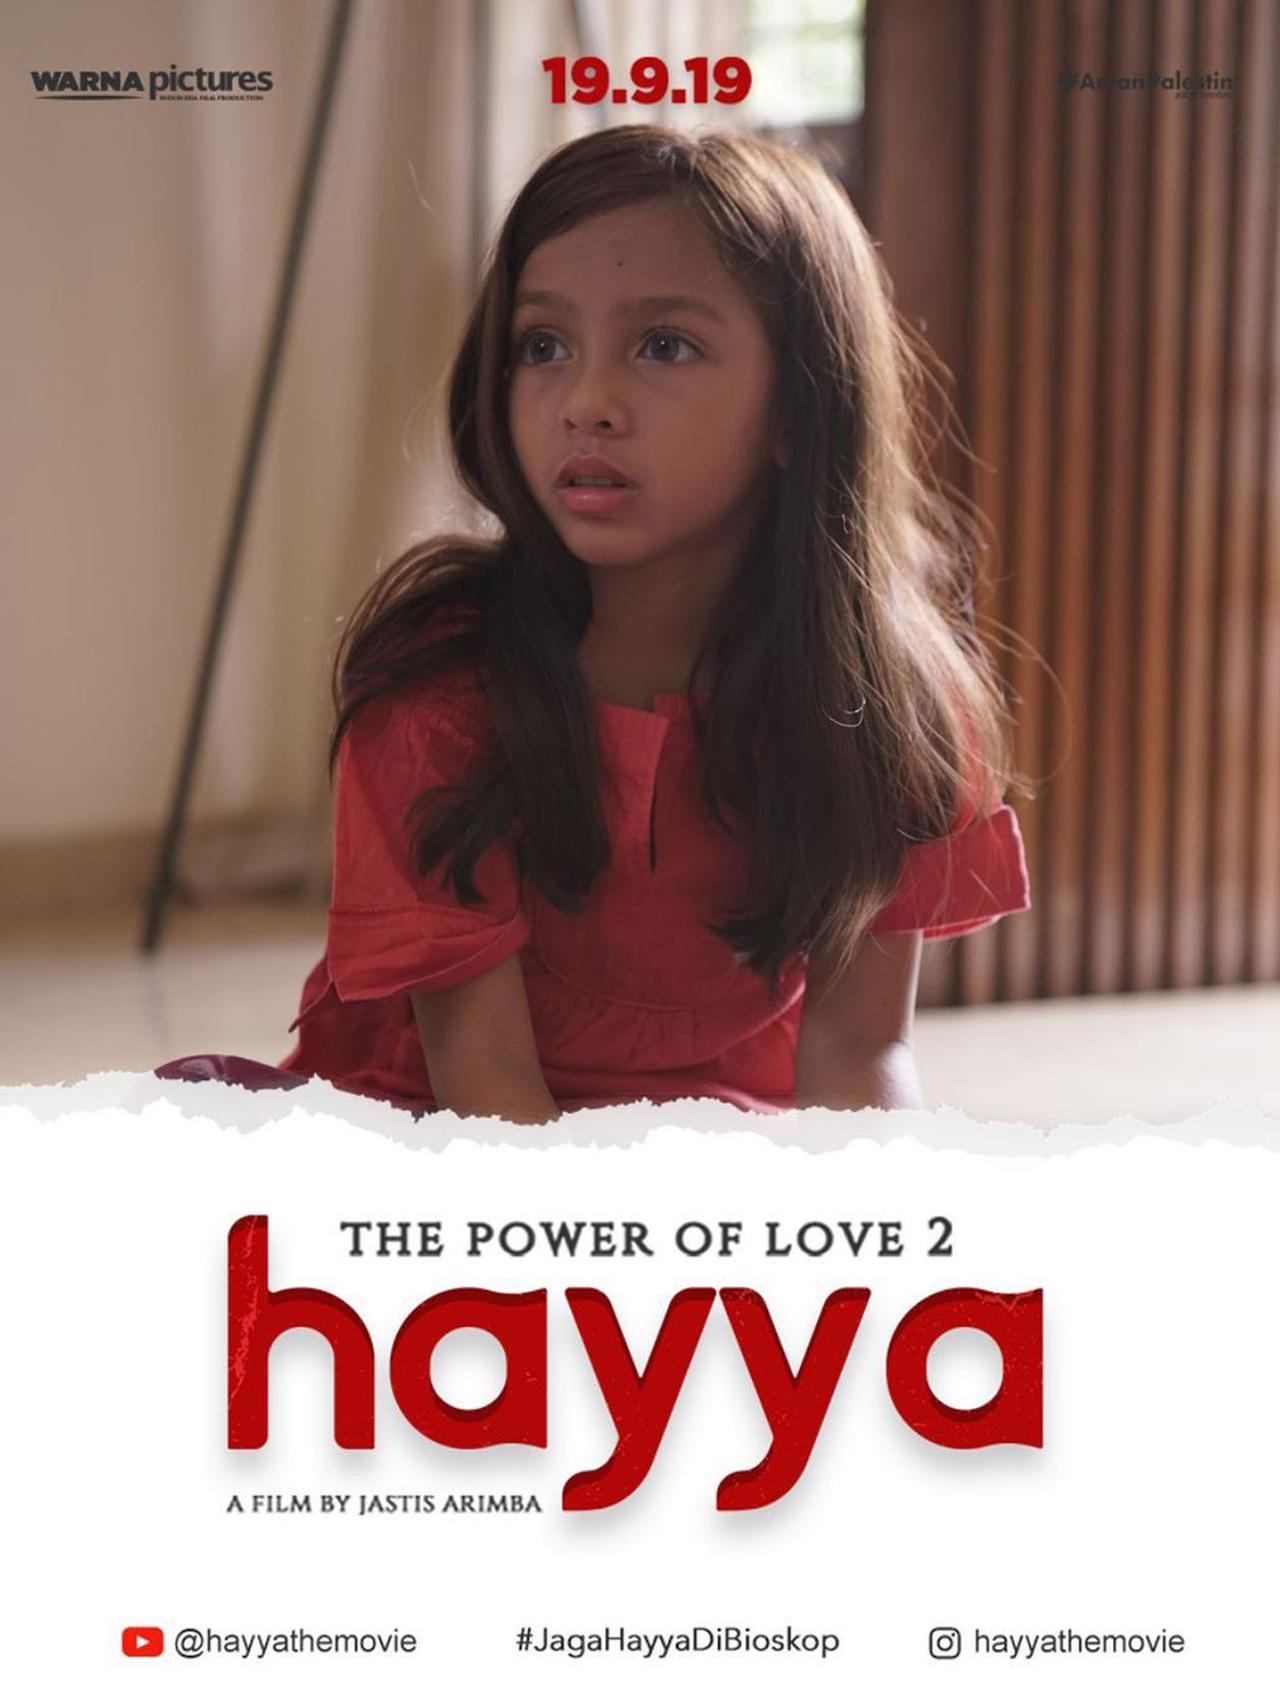 Hayya: The Power of Love 2 4